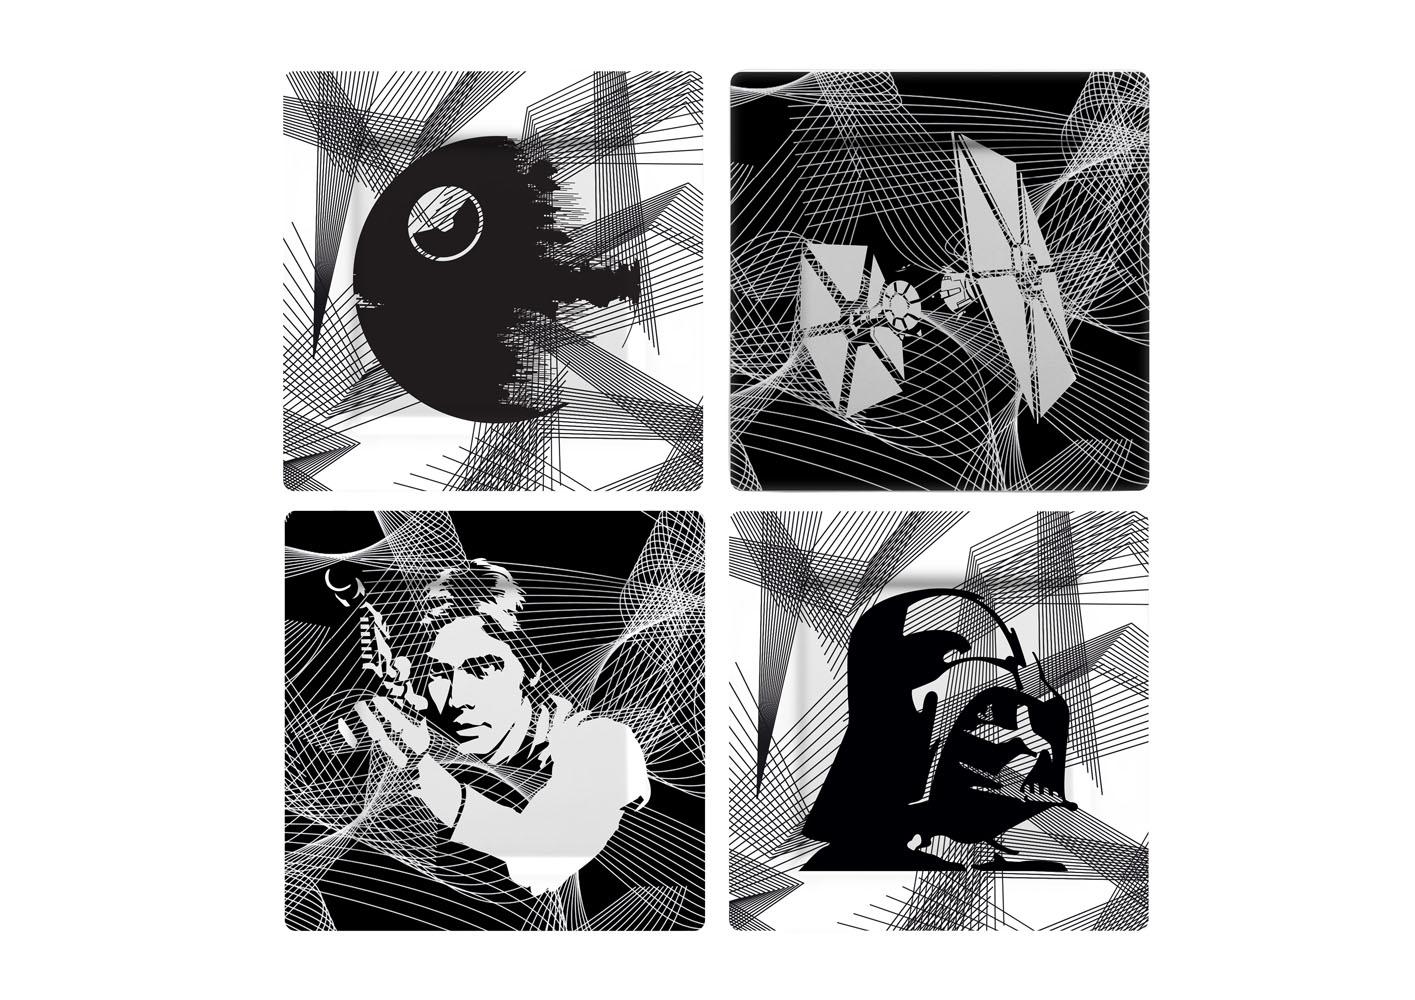 Star Wars Plates 4-Pack Intergalactic